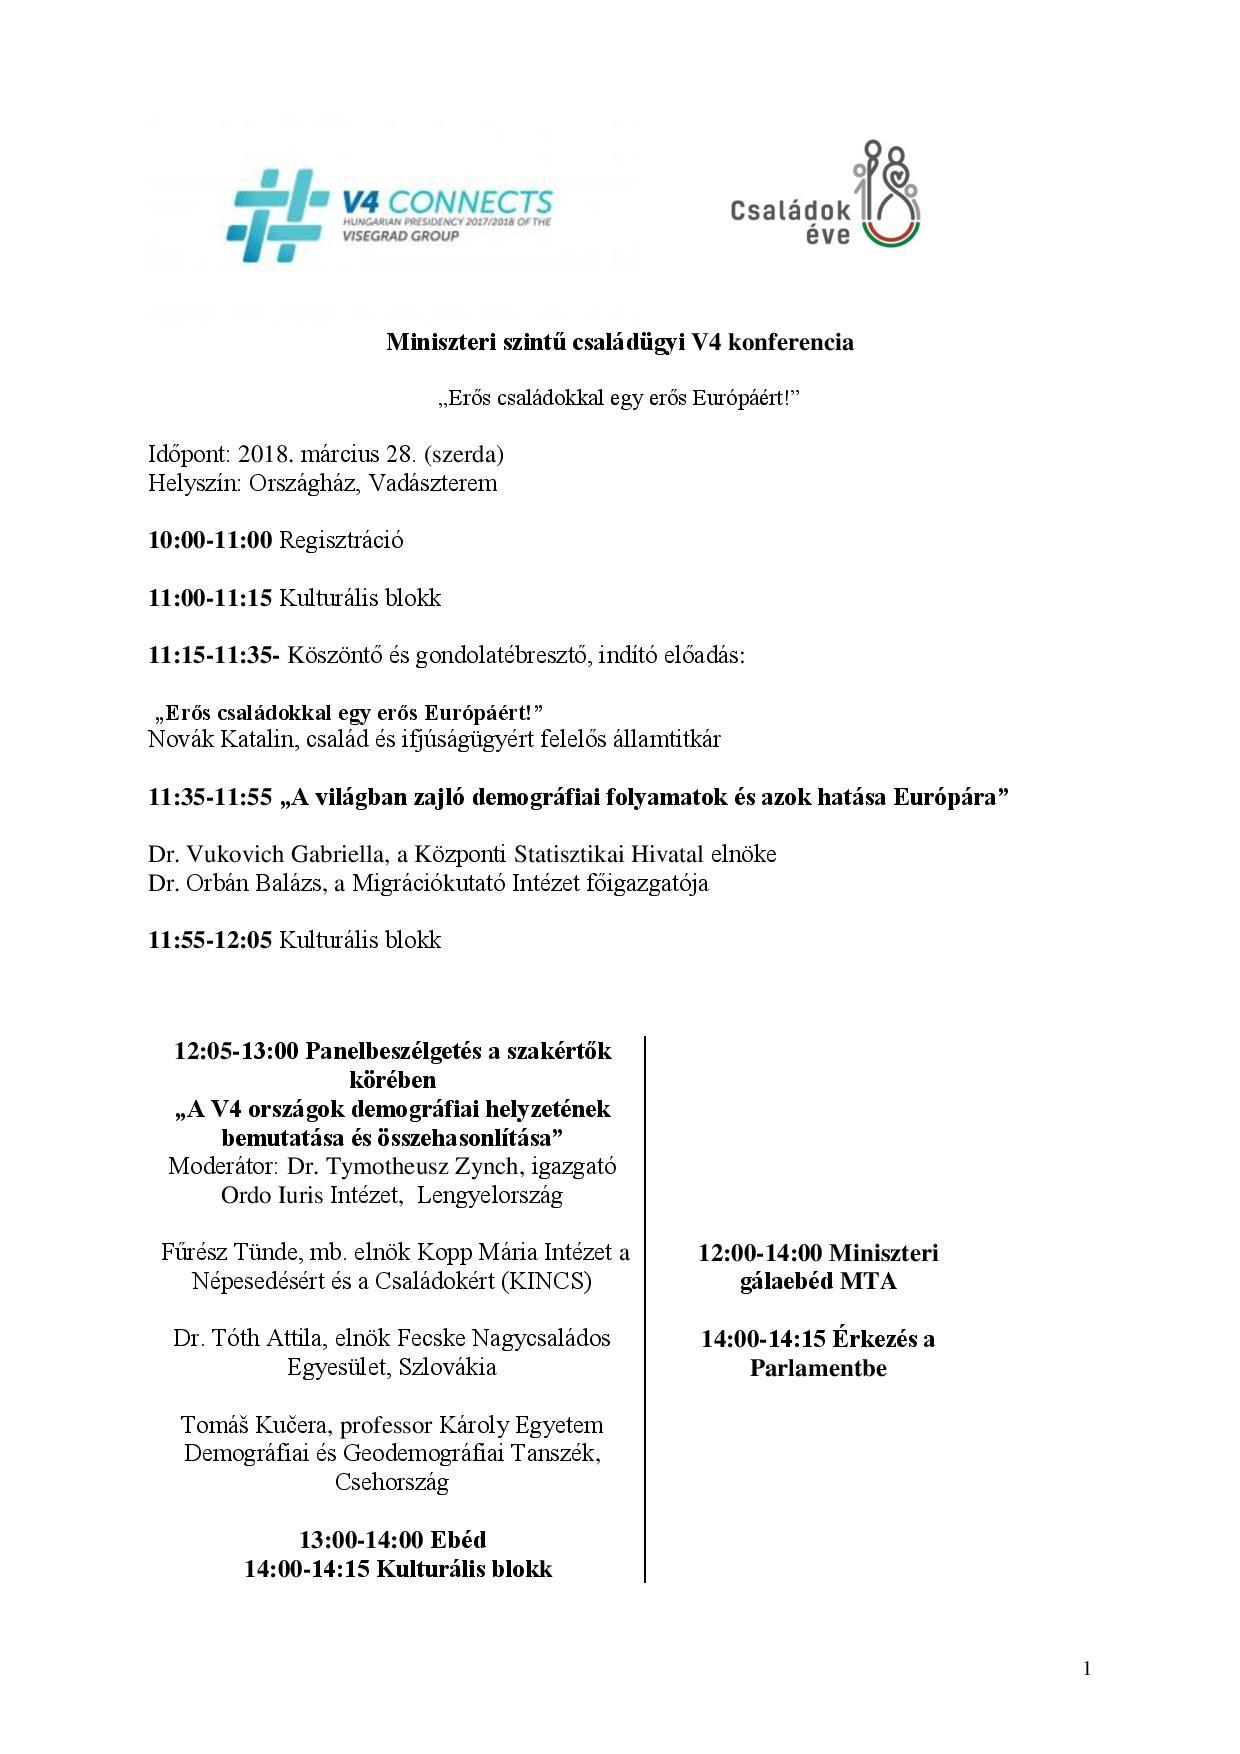 V4 Miniszteri Programterv Page 001